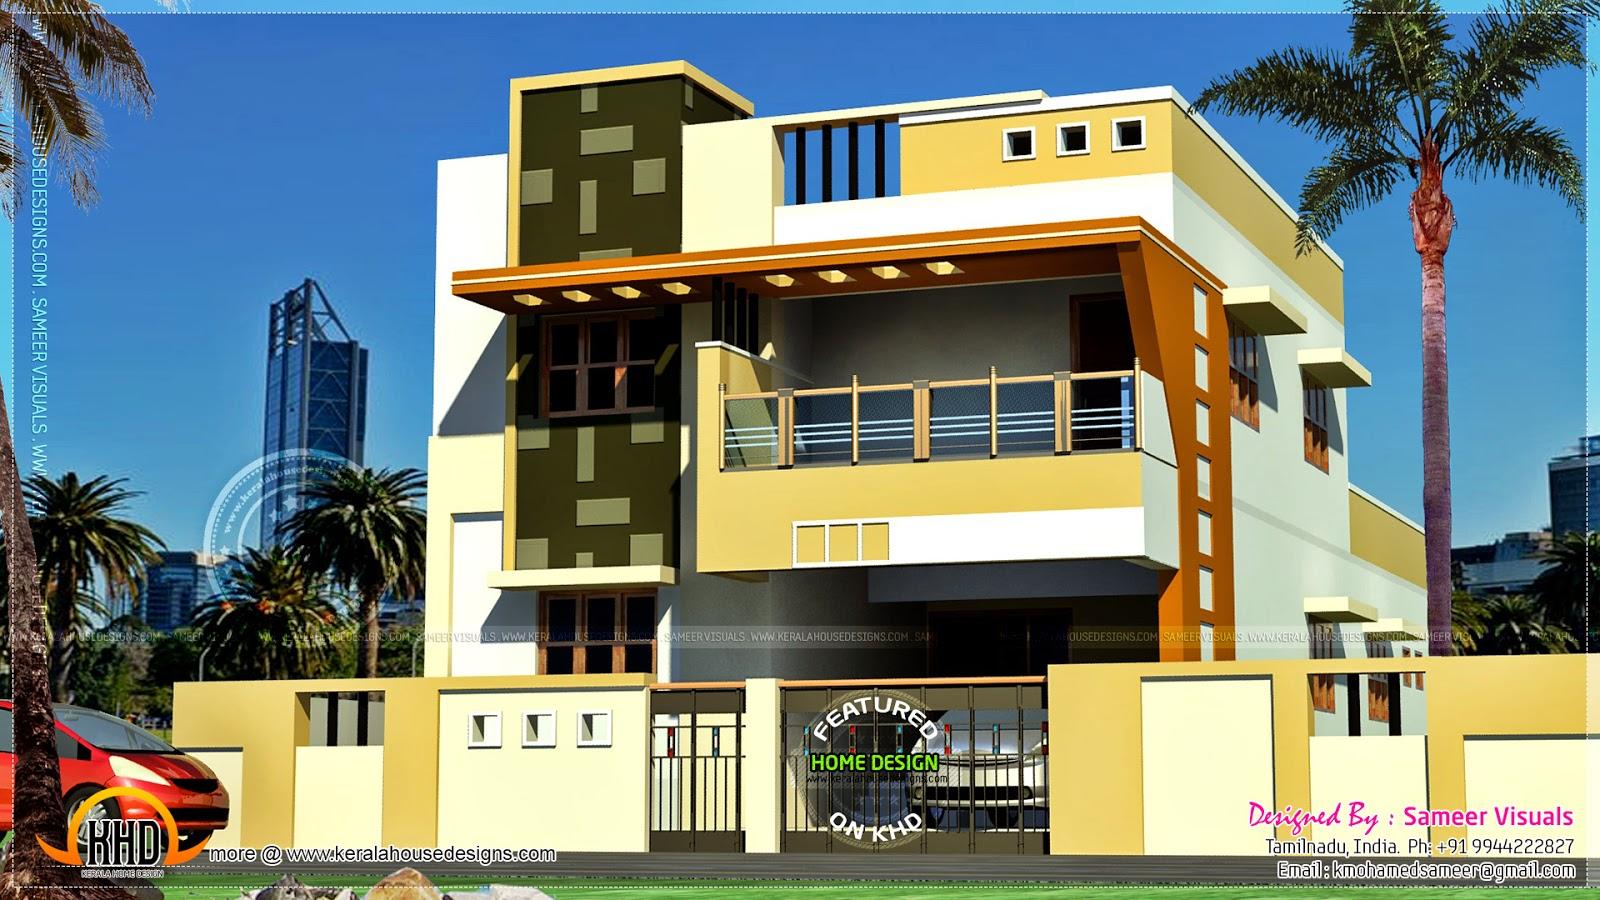 Modern South Indian house design | Home Kerala Plans